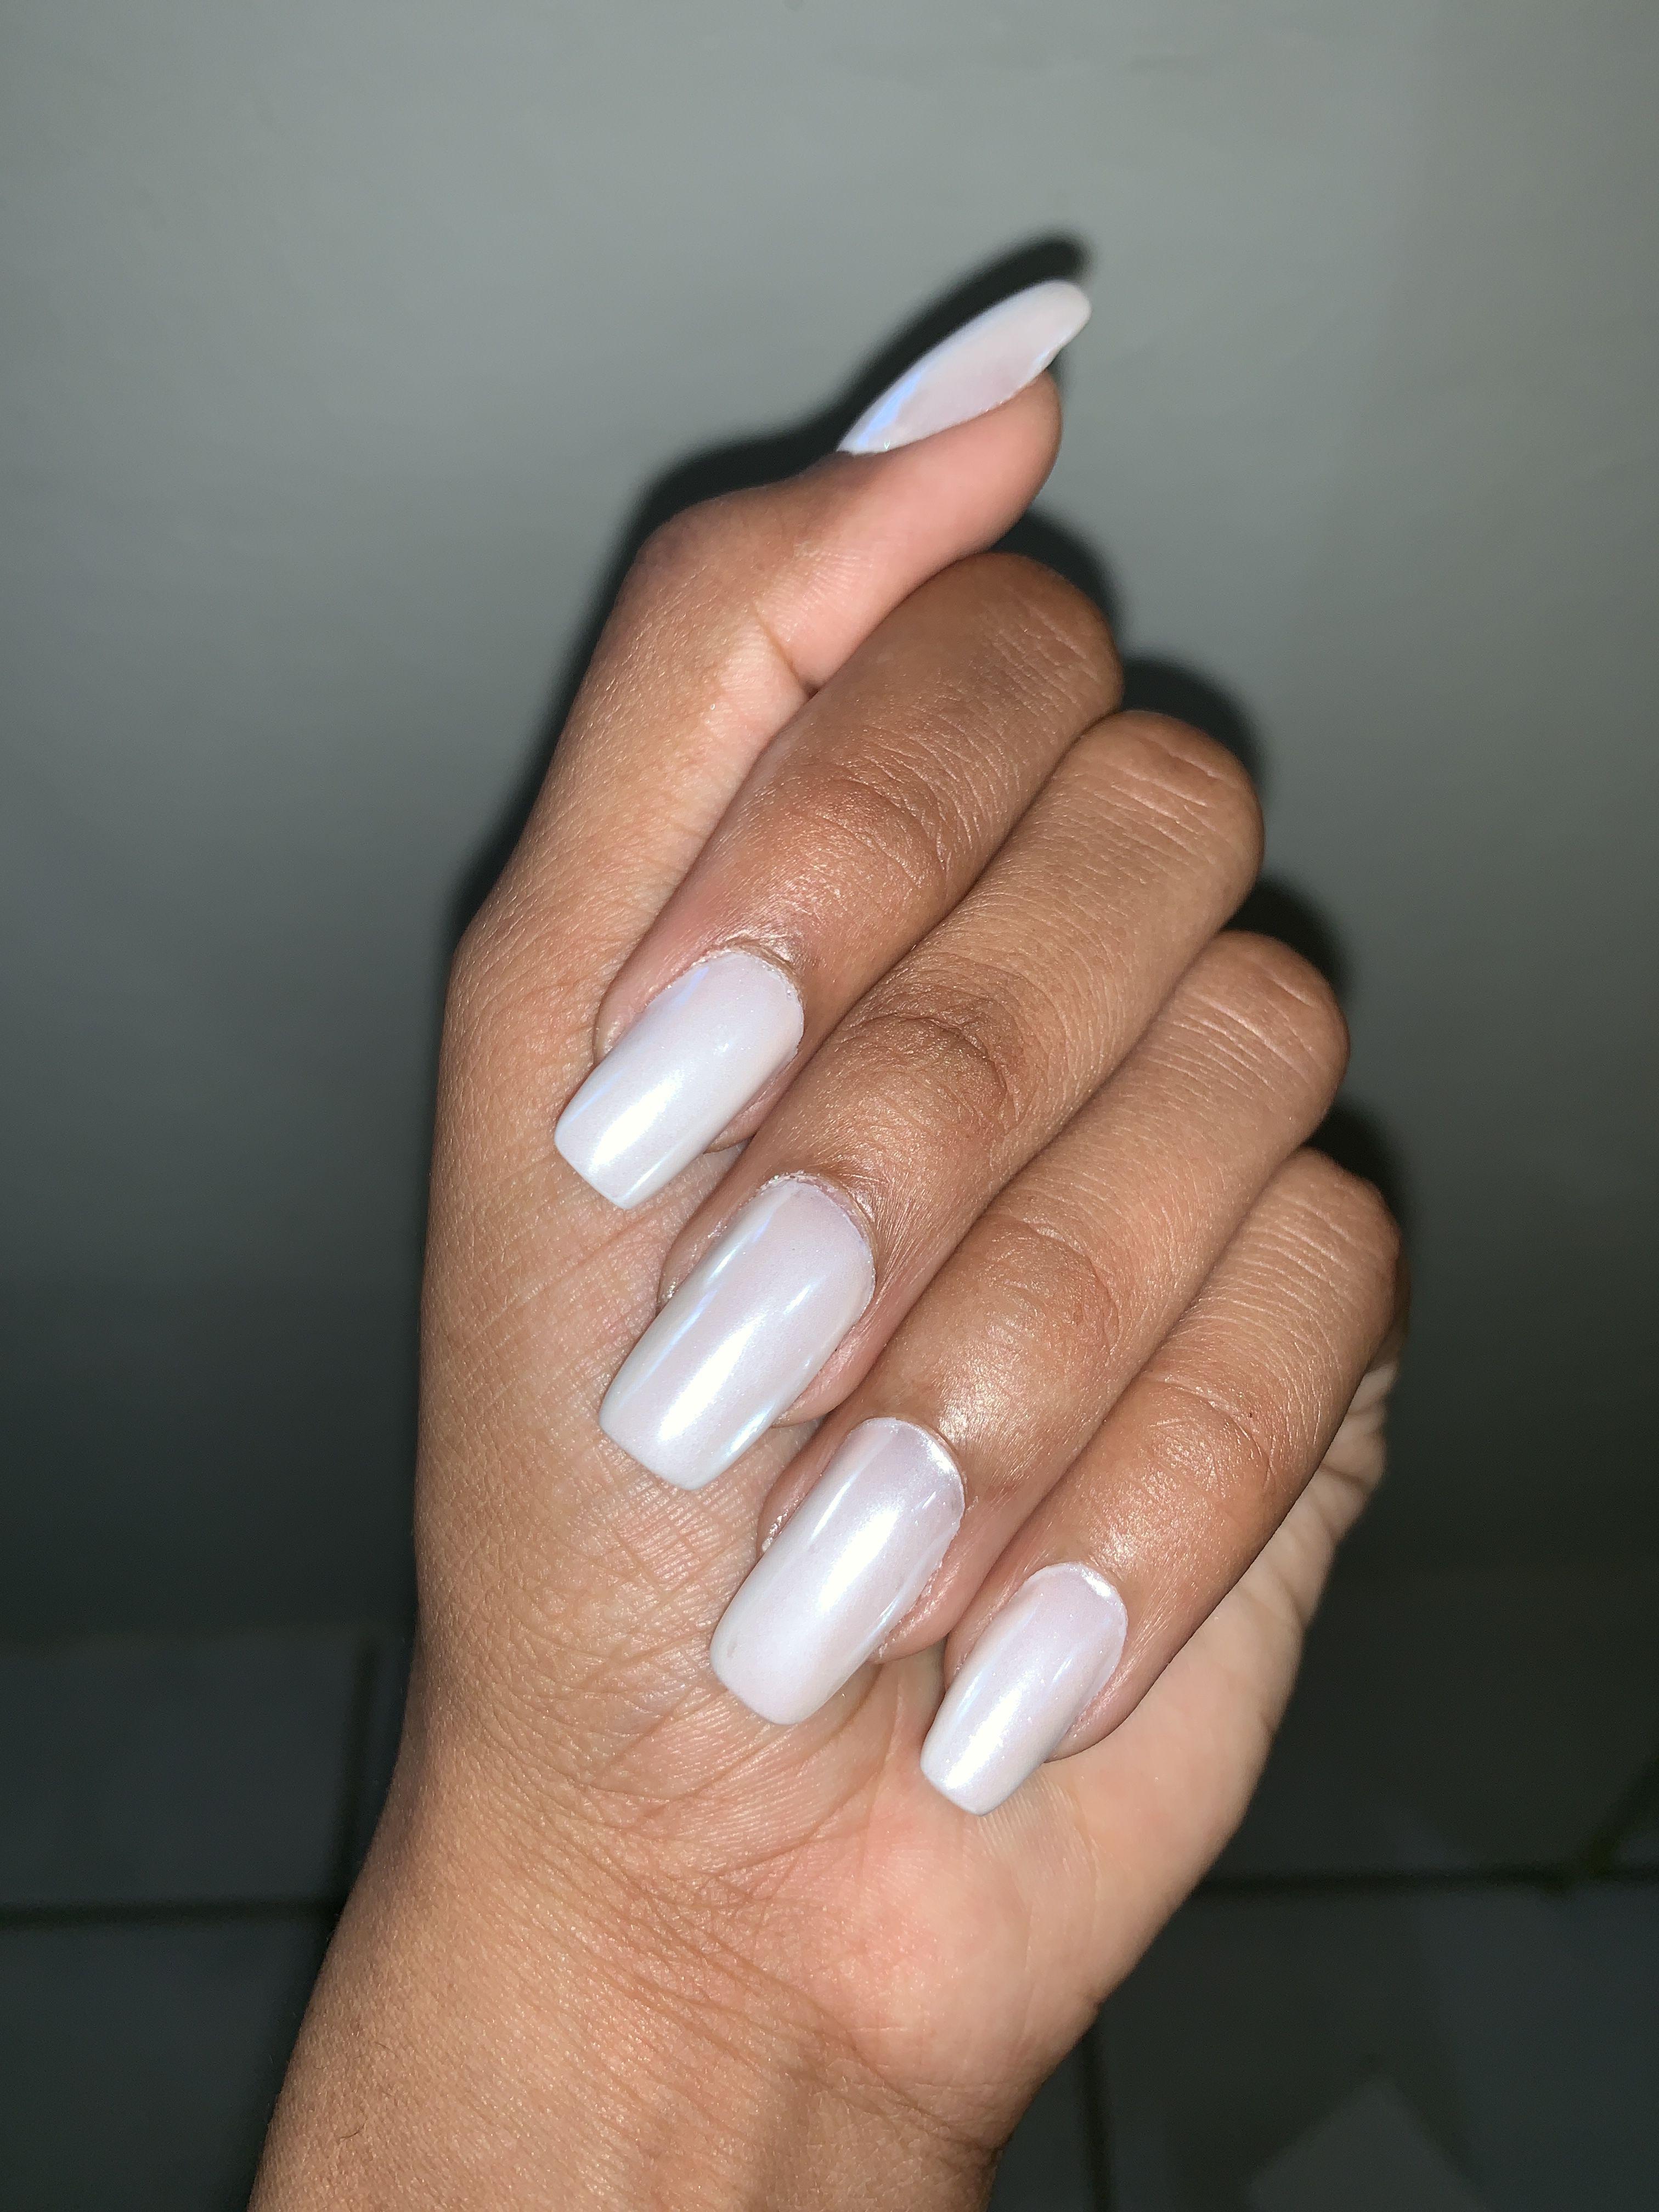 Polygel Nails Polygel Nails Nails Chrome Powder